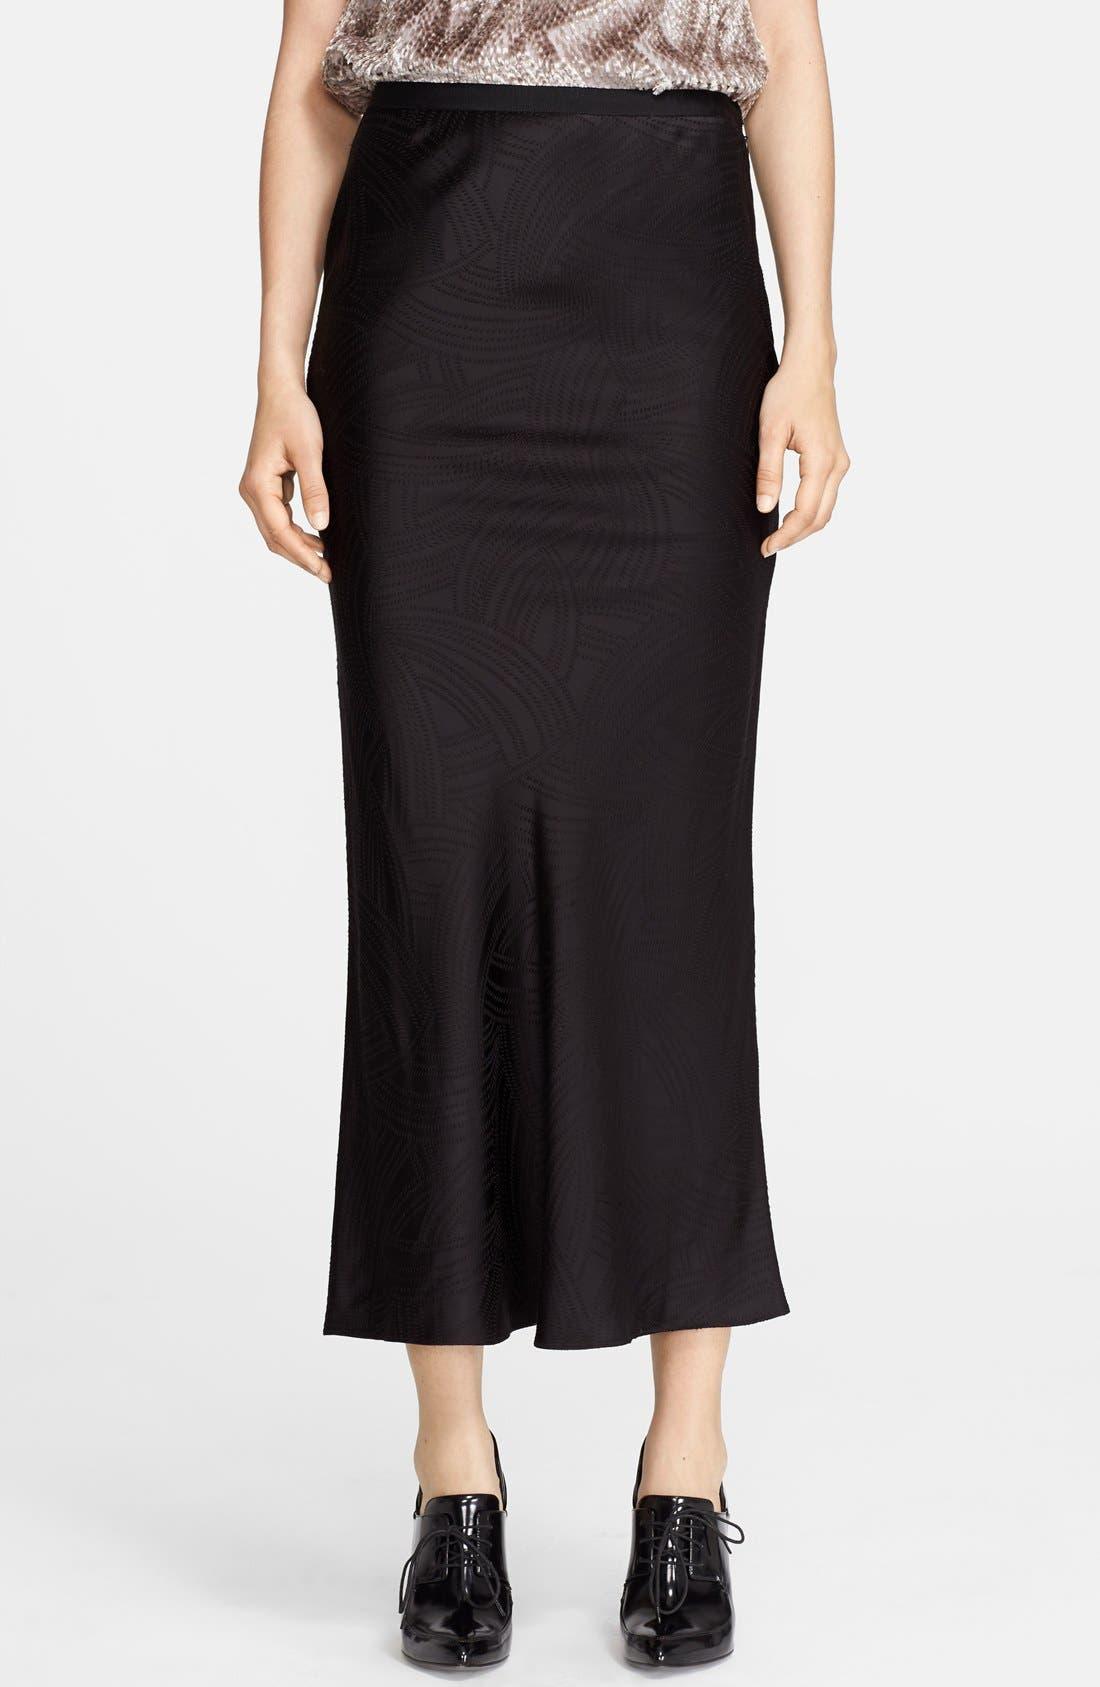 Alternate Image 1 Selected - Jason Wu Jacquard Midi Skirt